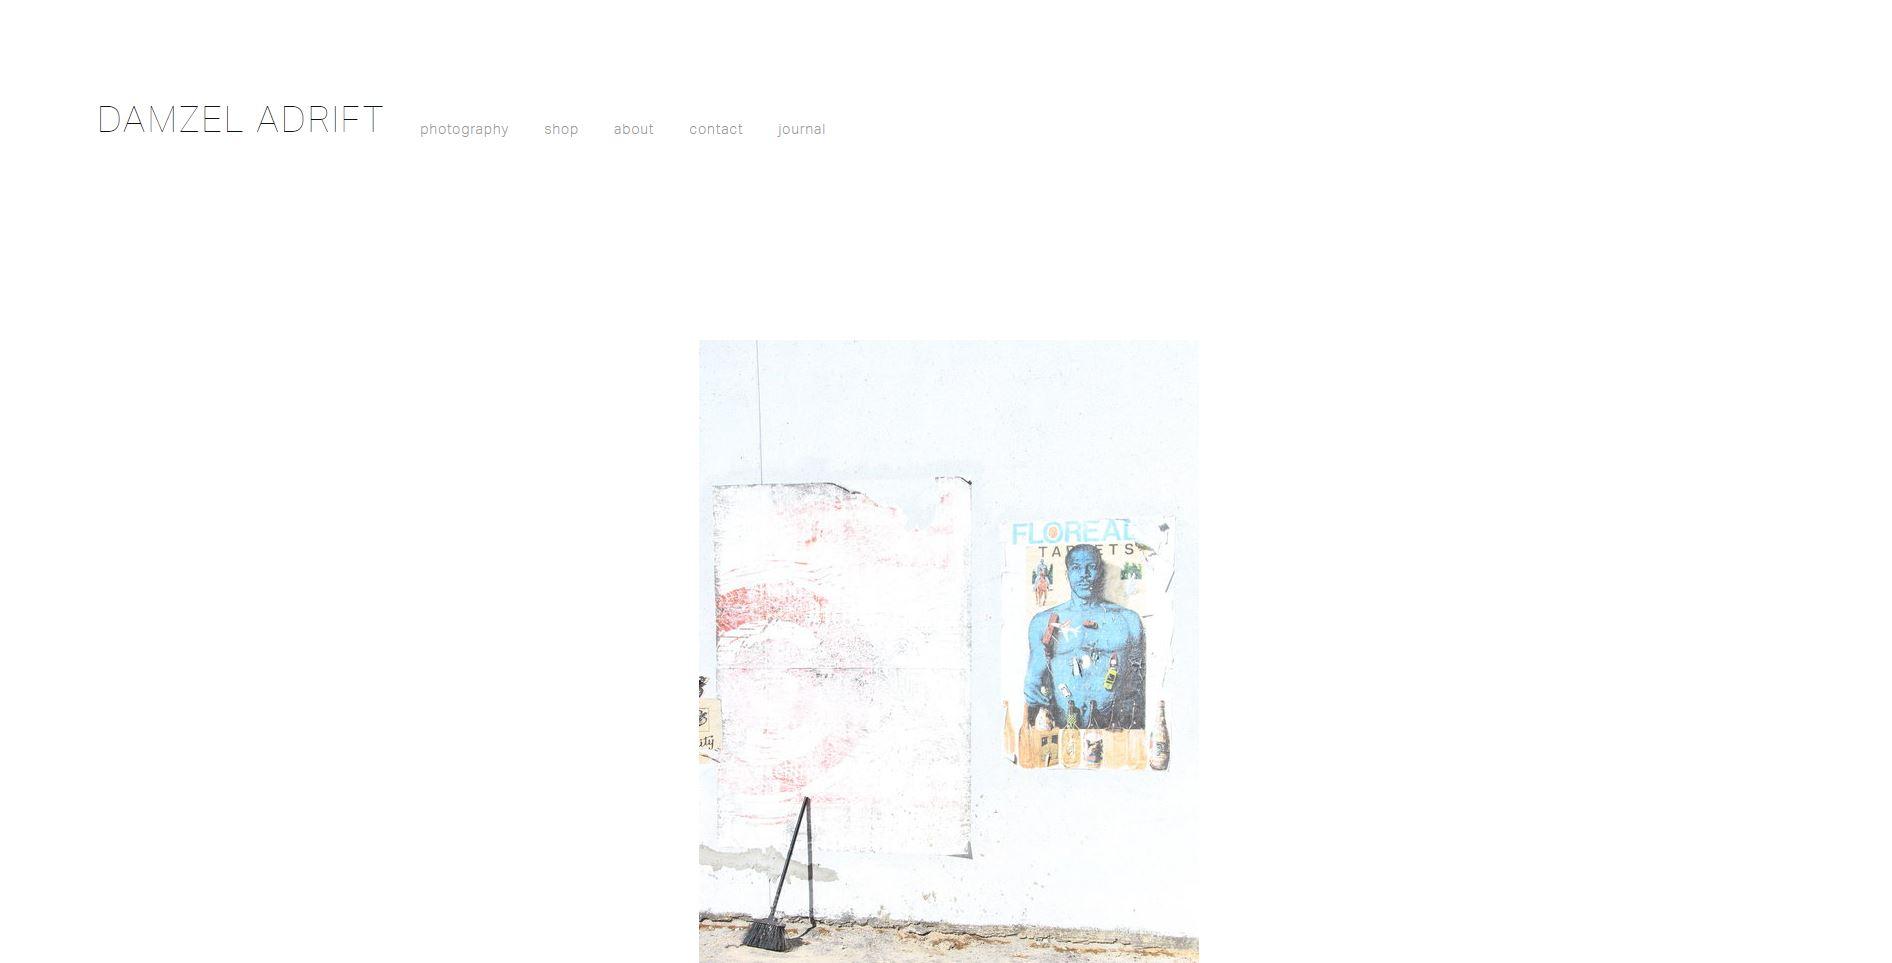 Damzel Adrift - Brand & Creative Portfolio   www.damzeladrift.com